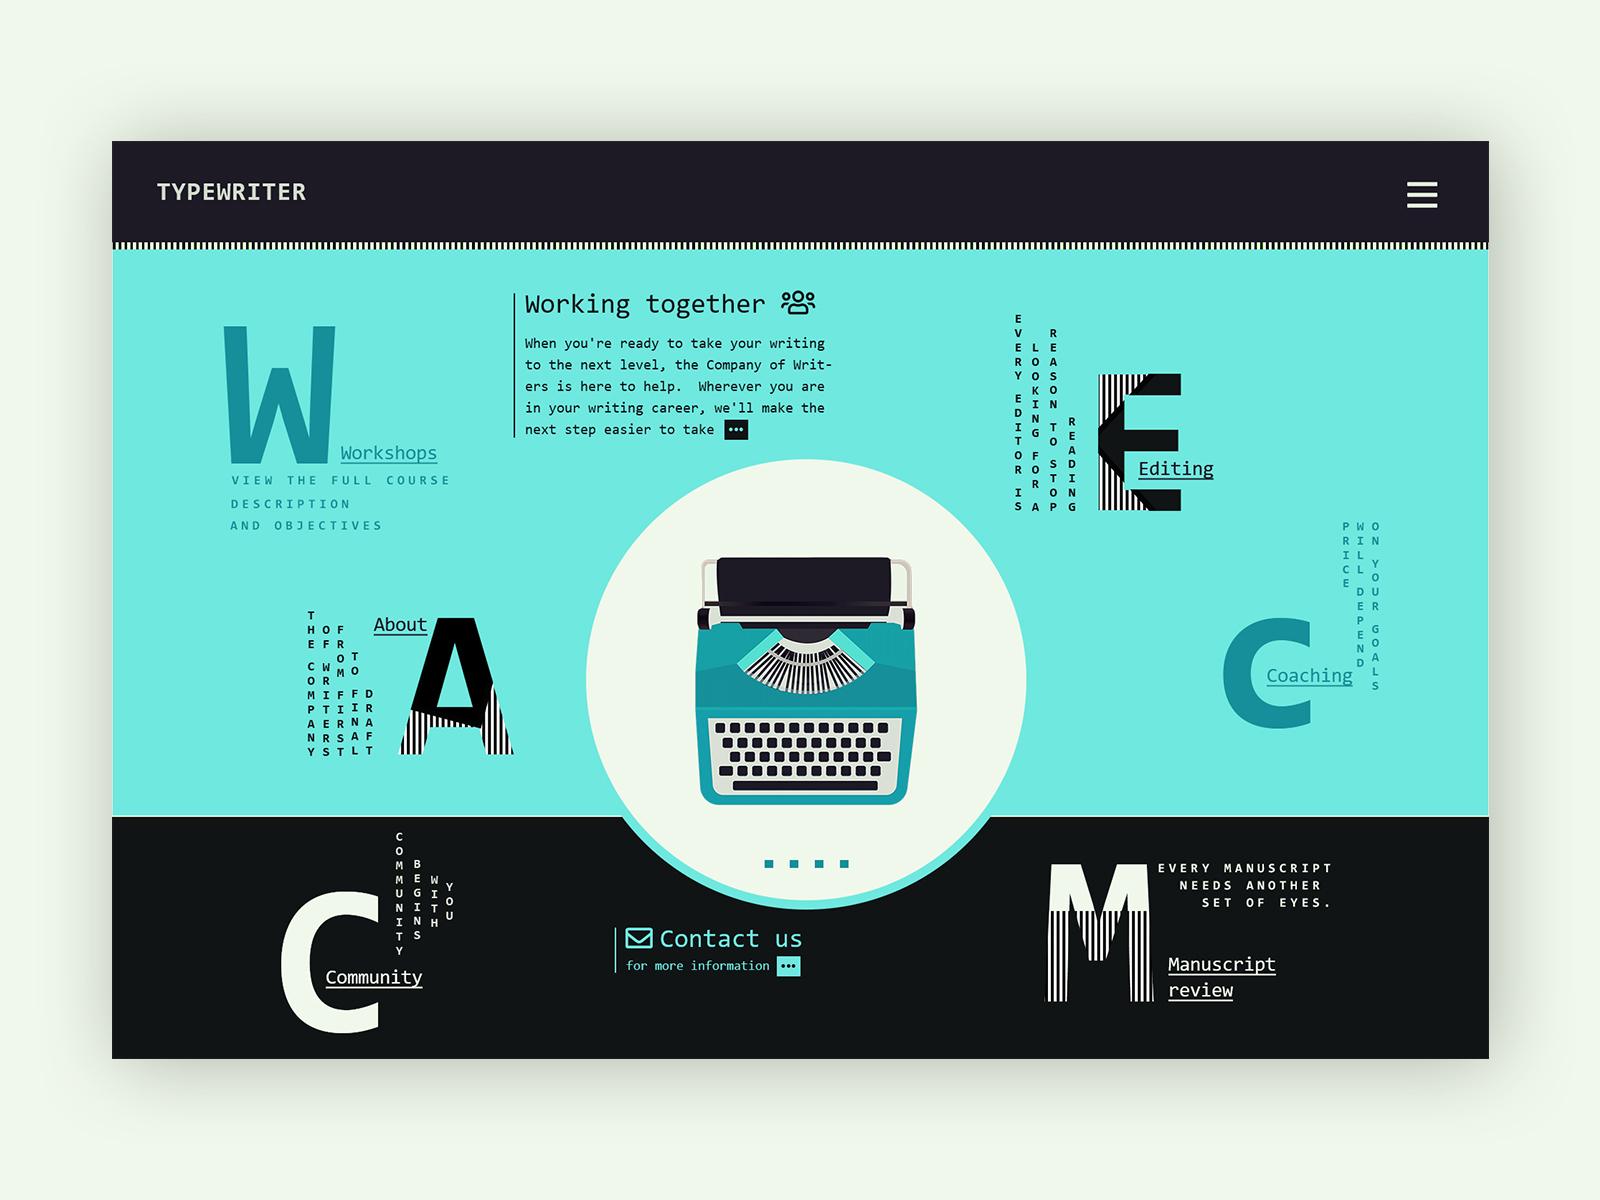 Typewriter company web design concepts 017 19